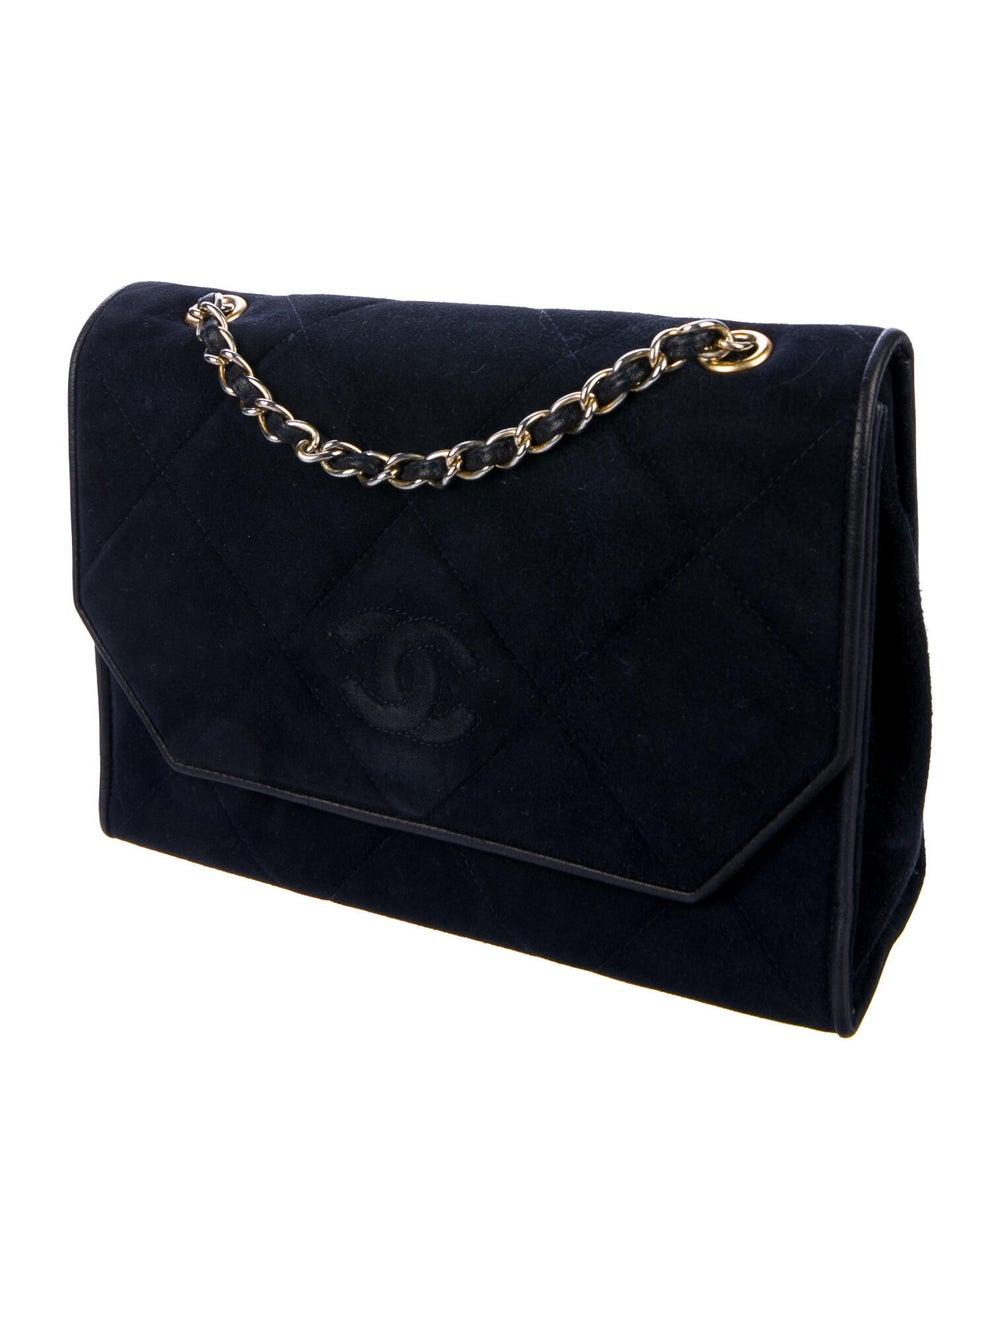 Chanel Vintage Quilted CC Flap Bag Blue - image 3